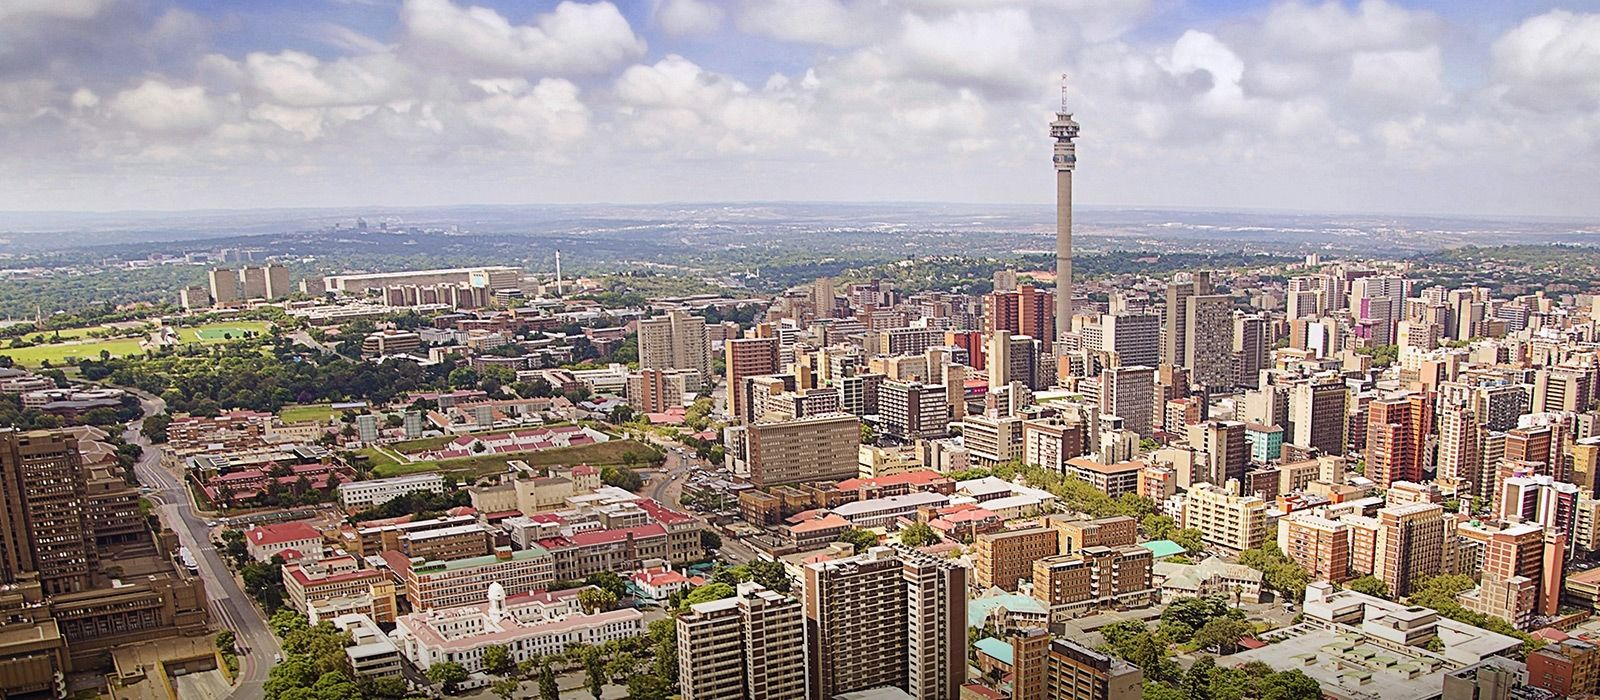 Destination Johannesburg South Africa